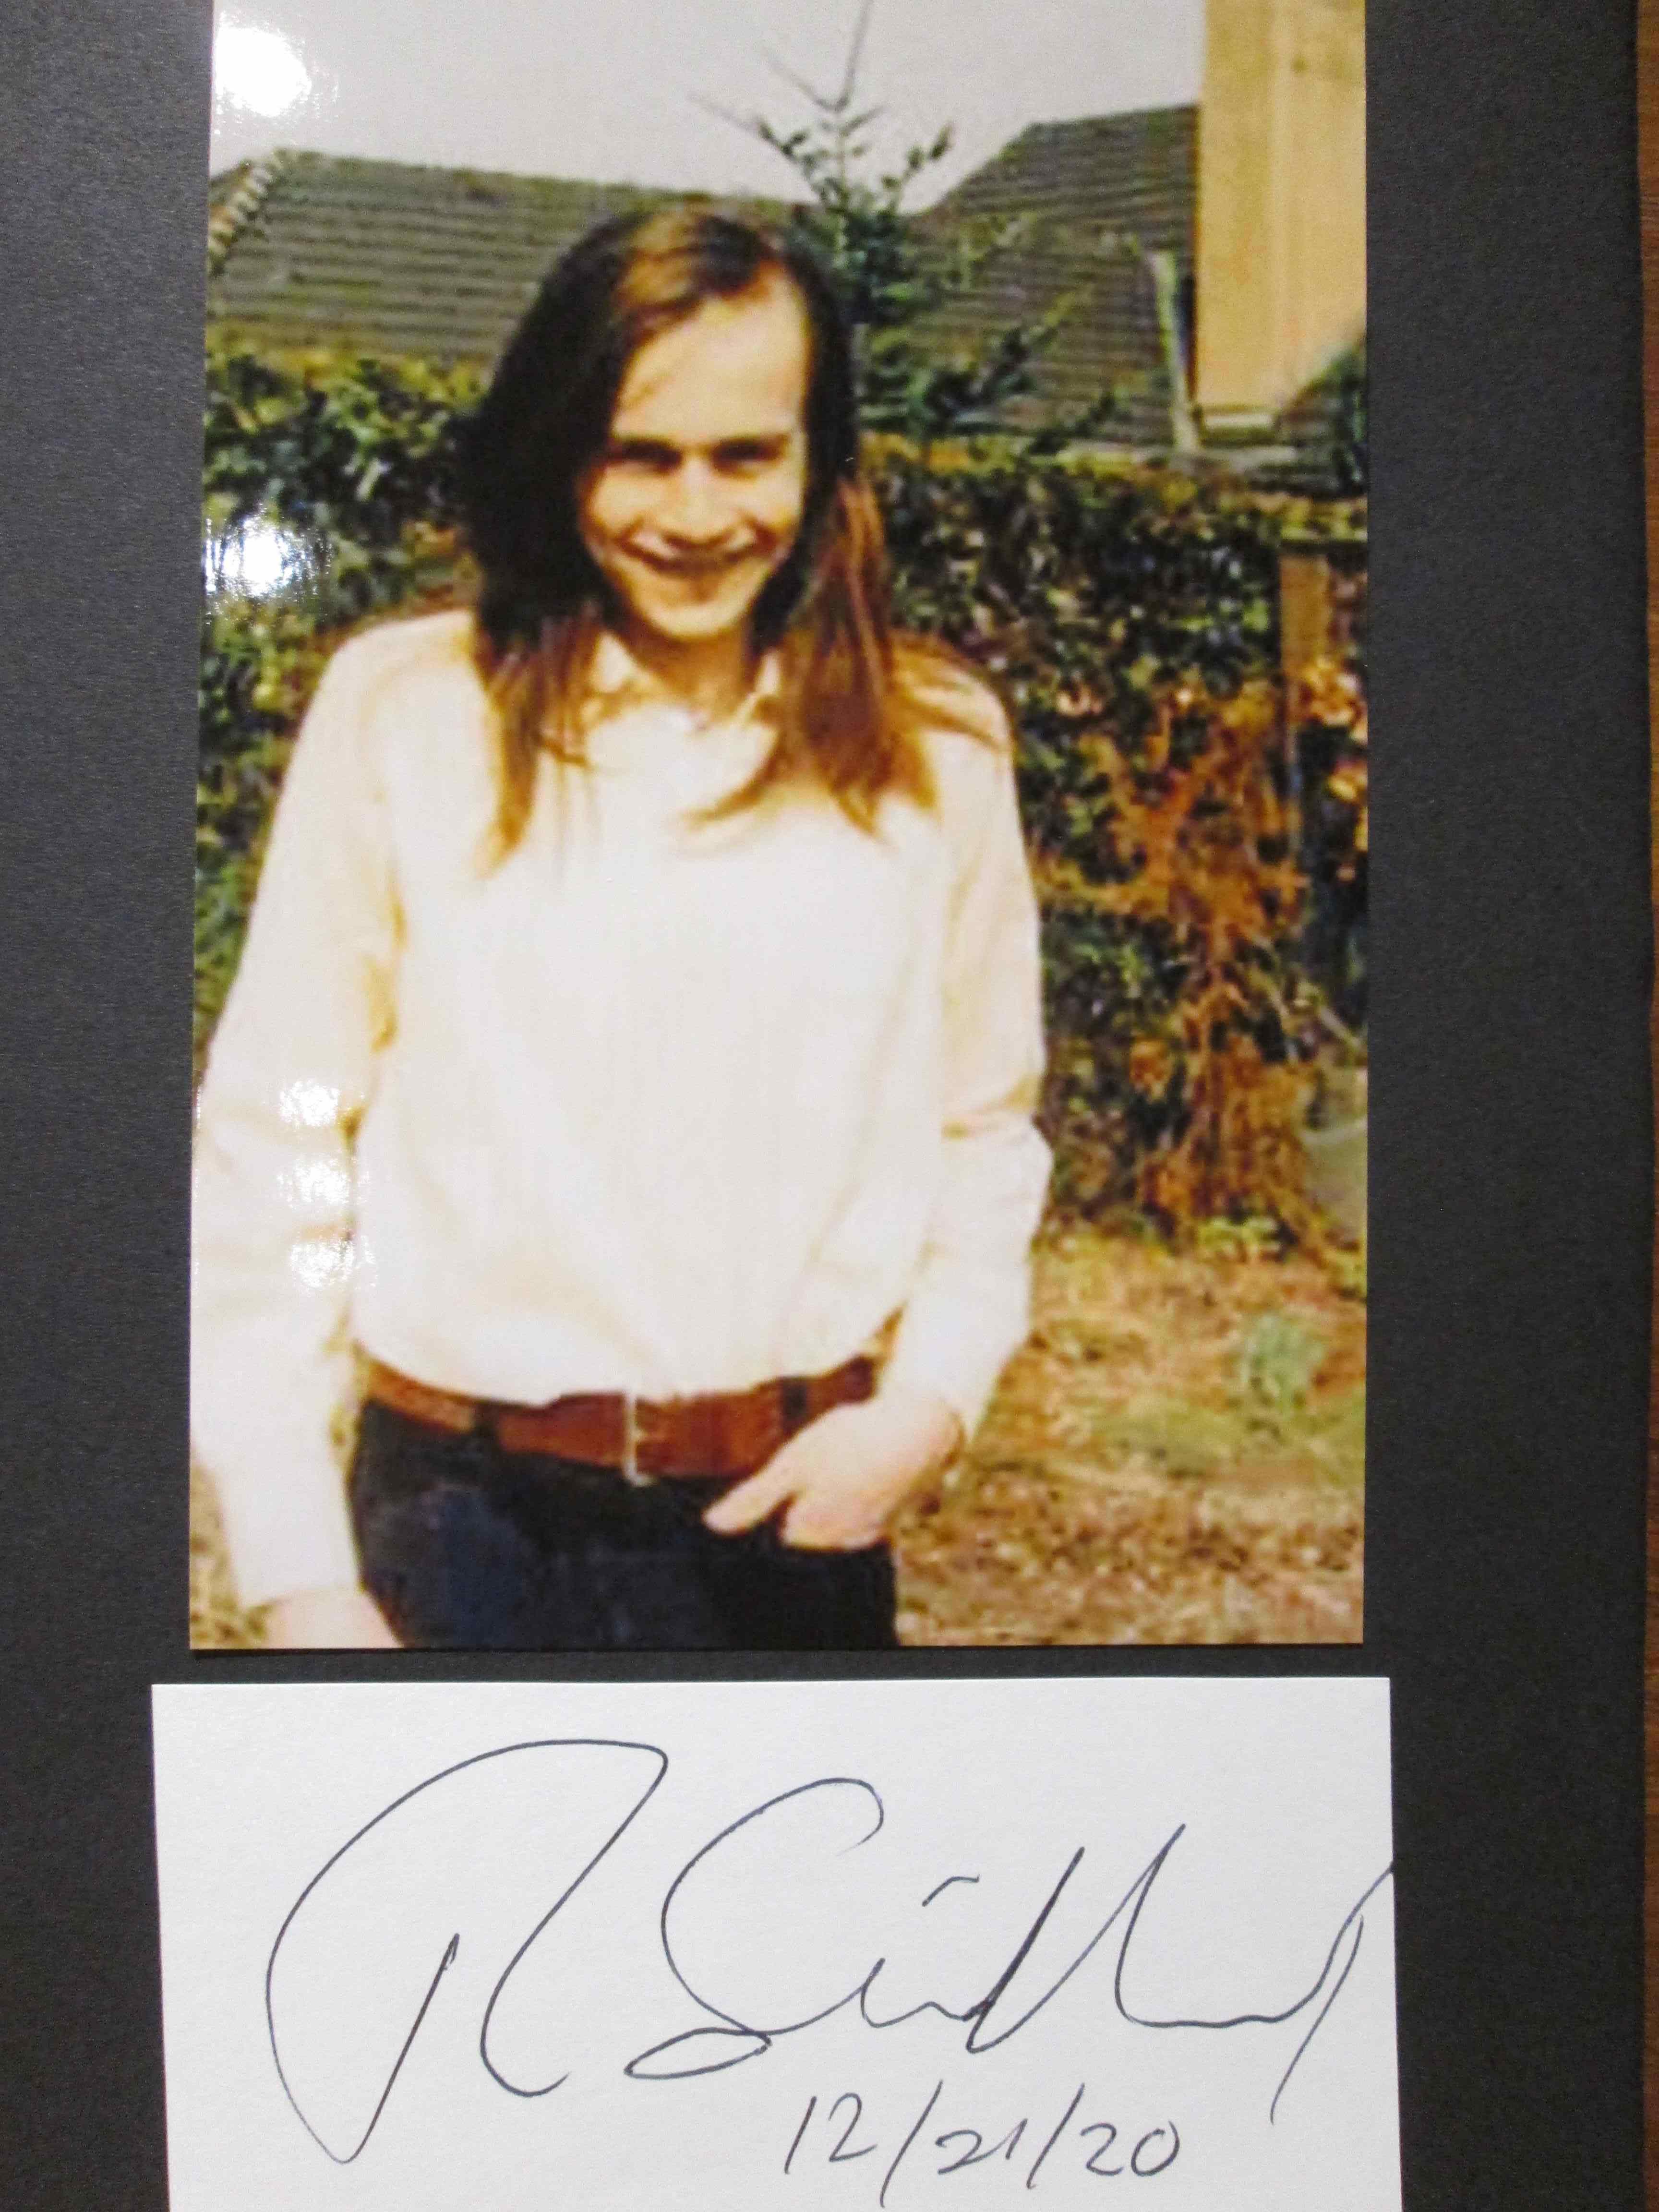 Südhof, Thomas : Thomas Südhof Nobelpreis für Physiologie oder Medizin 2013 // Autogramm Autograph signiert signed signee